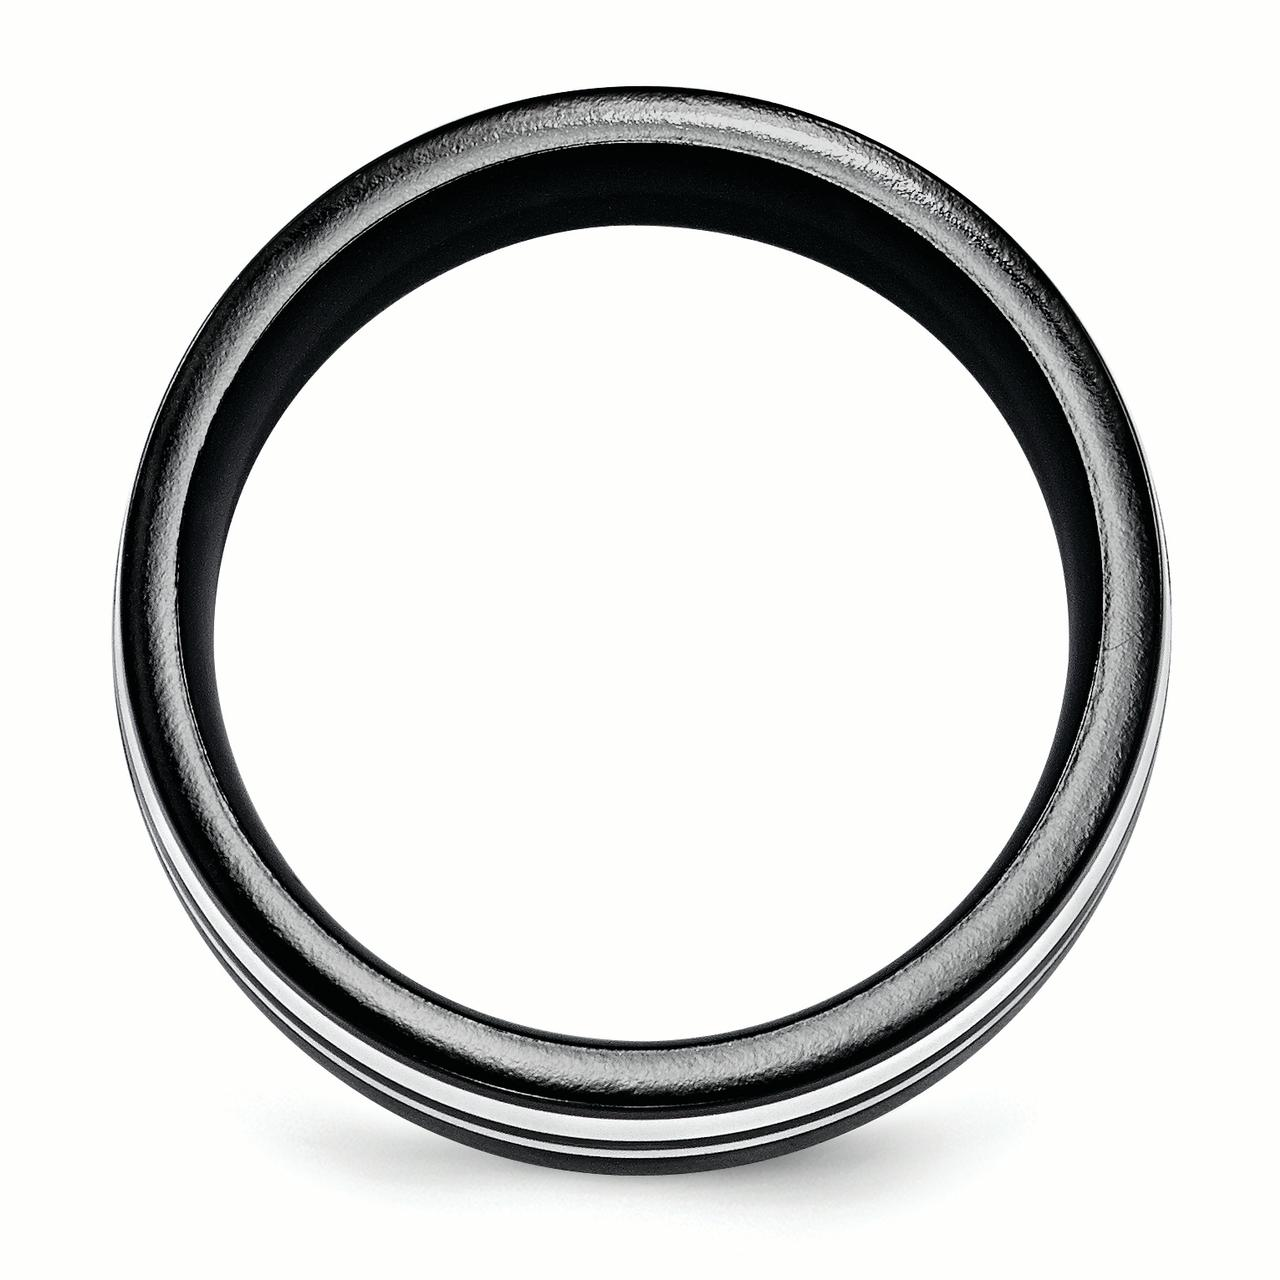 Edward Mirell Black Ti & Sterling Silver 9mm Polished Band Size 8 - image 1 of 3